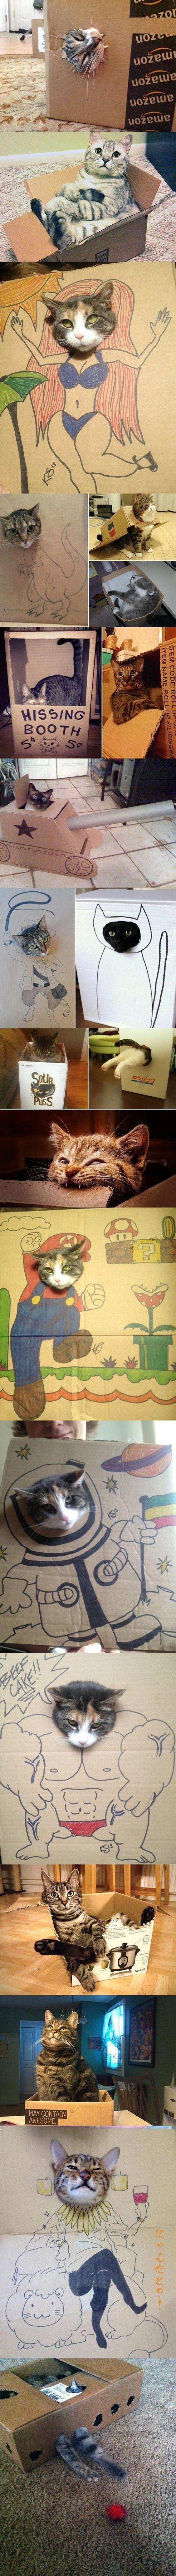 Katzen lieben Kartons.